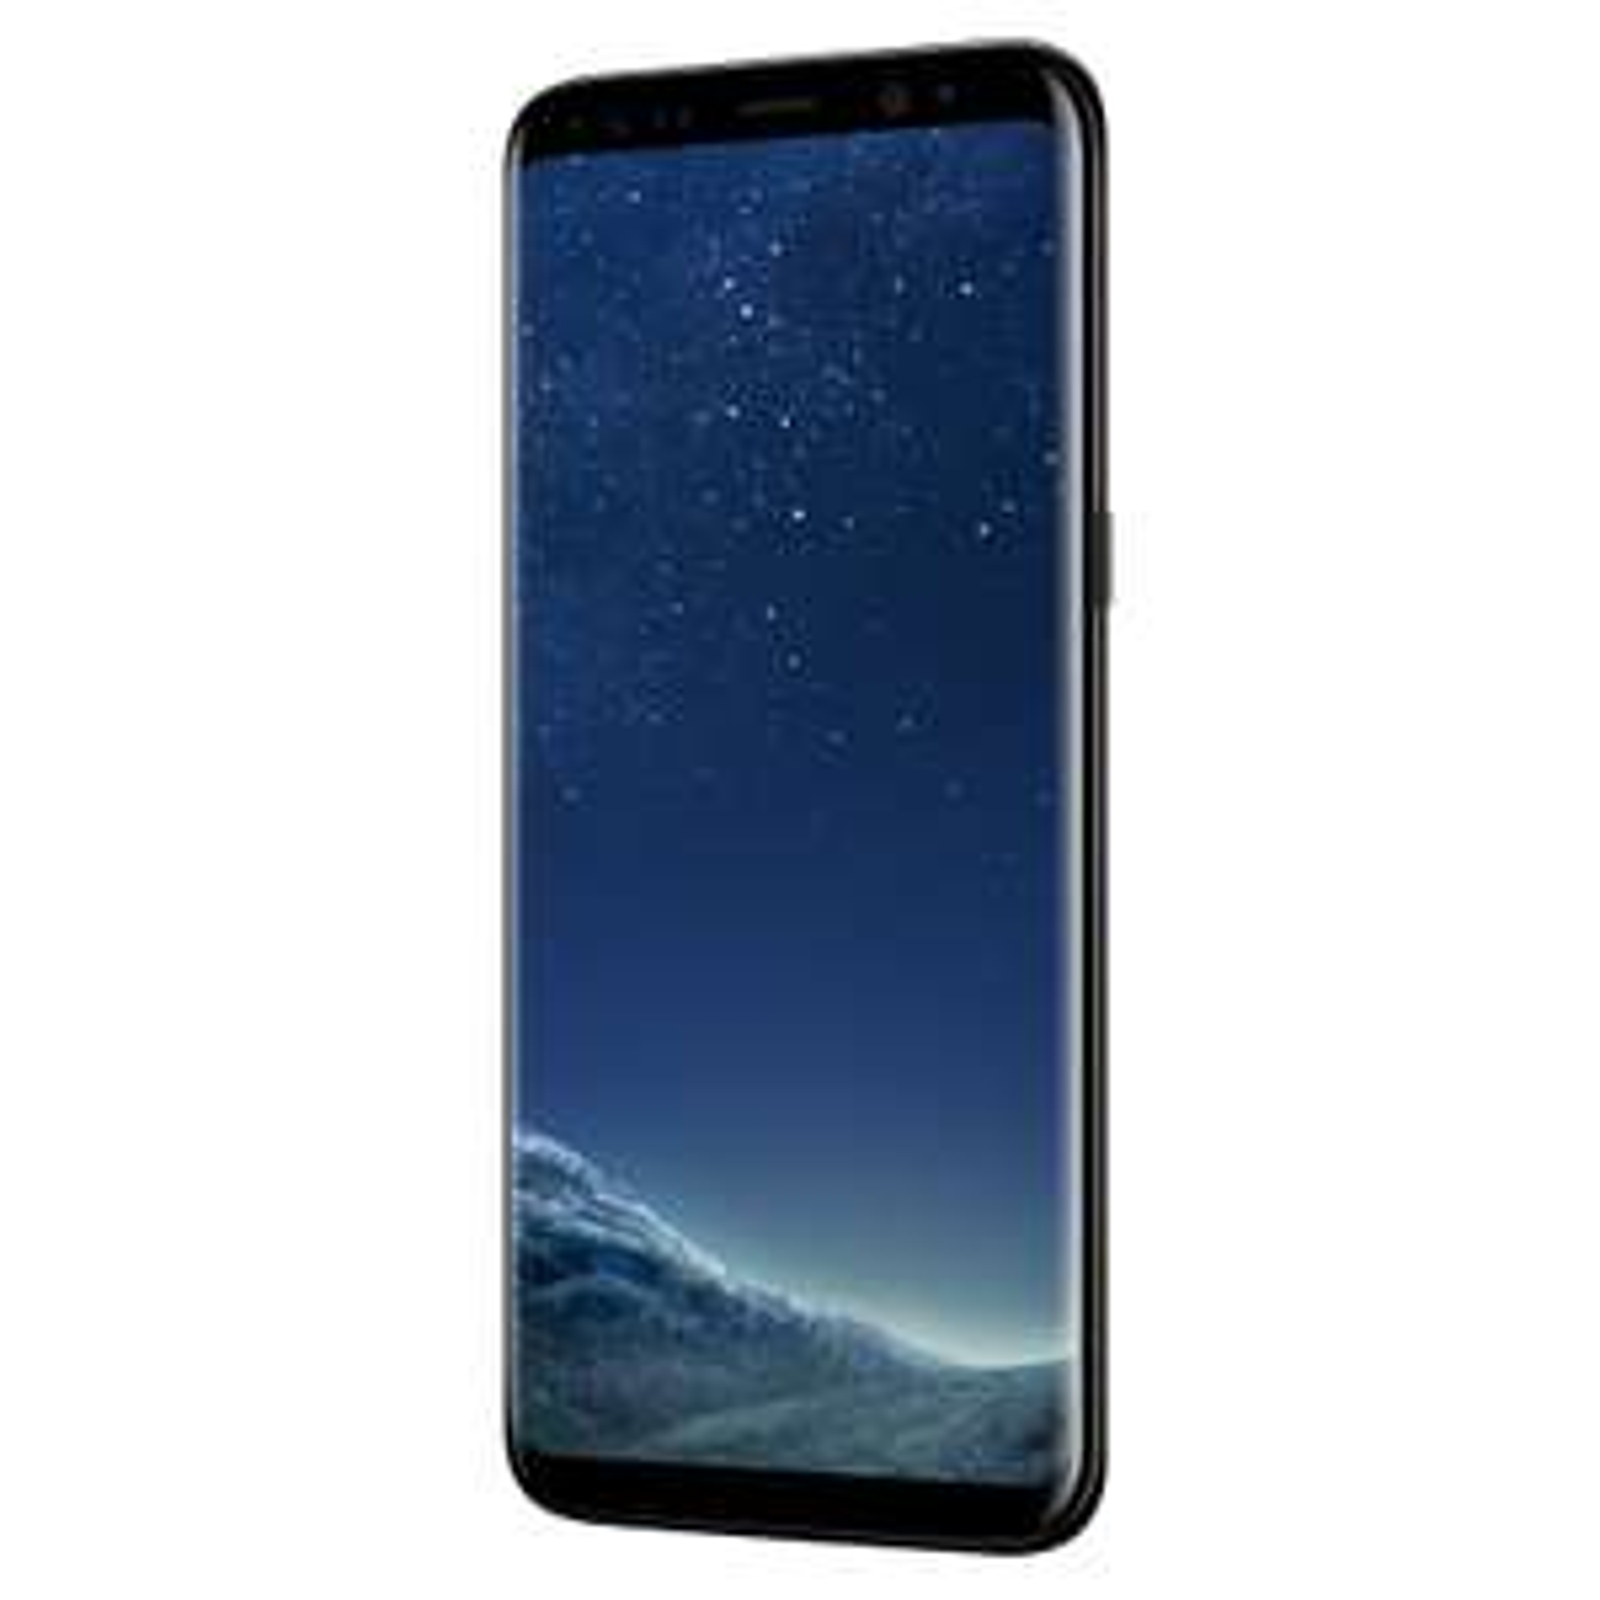 "Smartphone 5.8"" Samsung Galaxy S8 Noir Carbon - Exynos 8895, 4 Go de RAM, 64 Go (+81€ offerts en Super Points)"